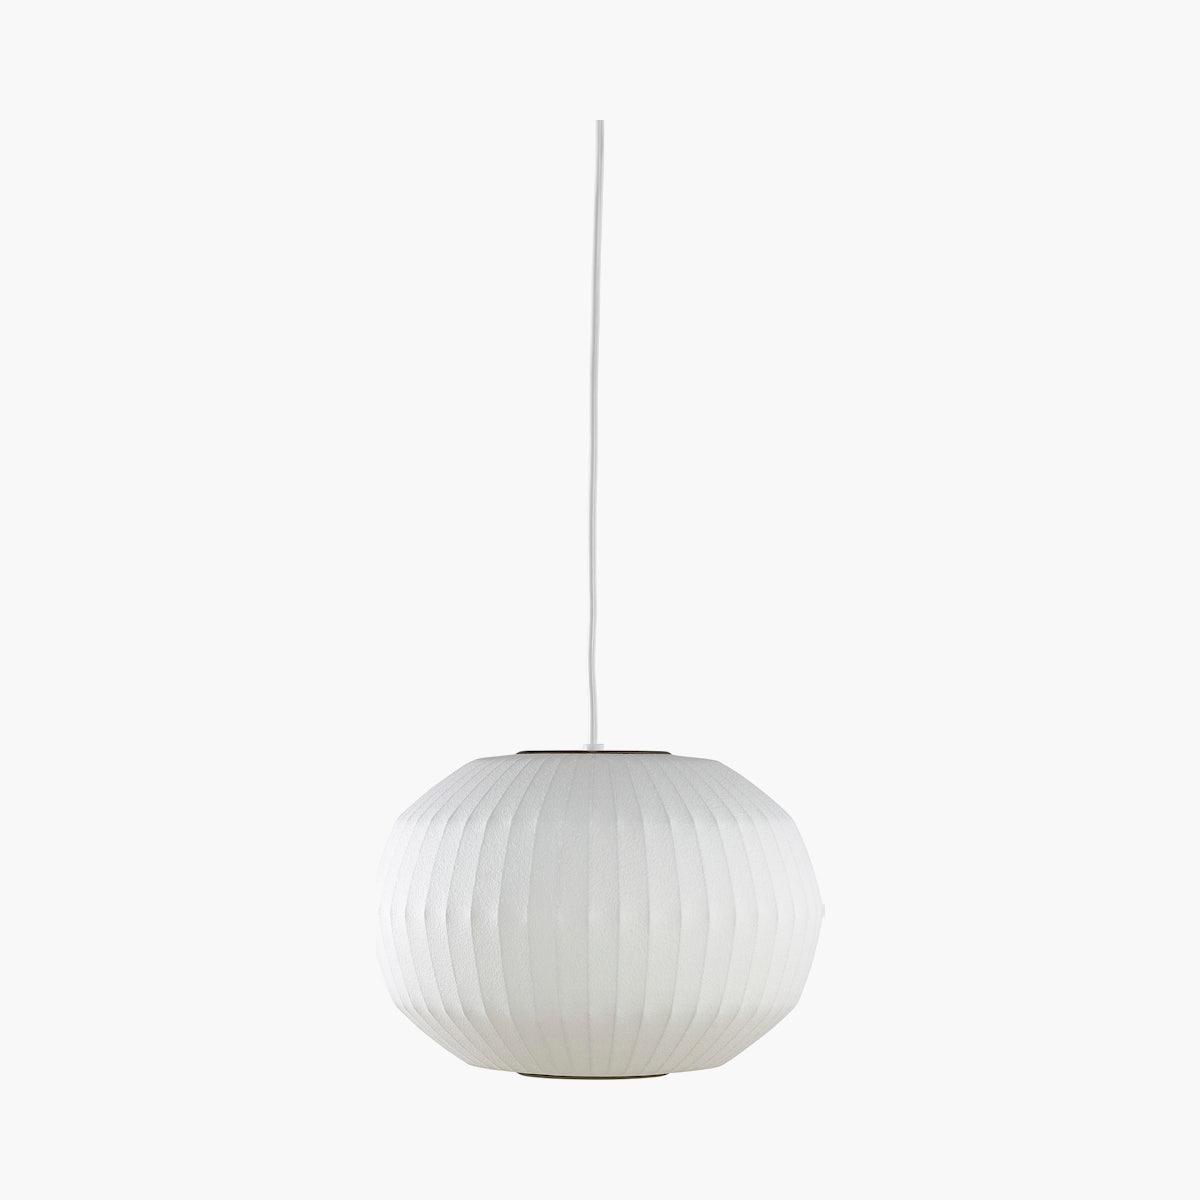 Nelson Angled Sphere Bubble Pendant